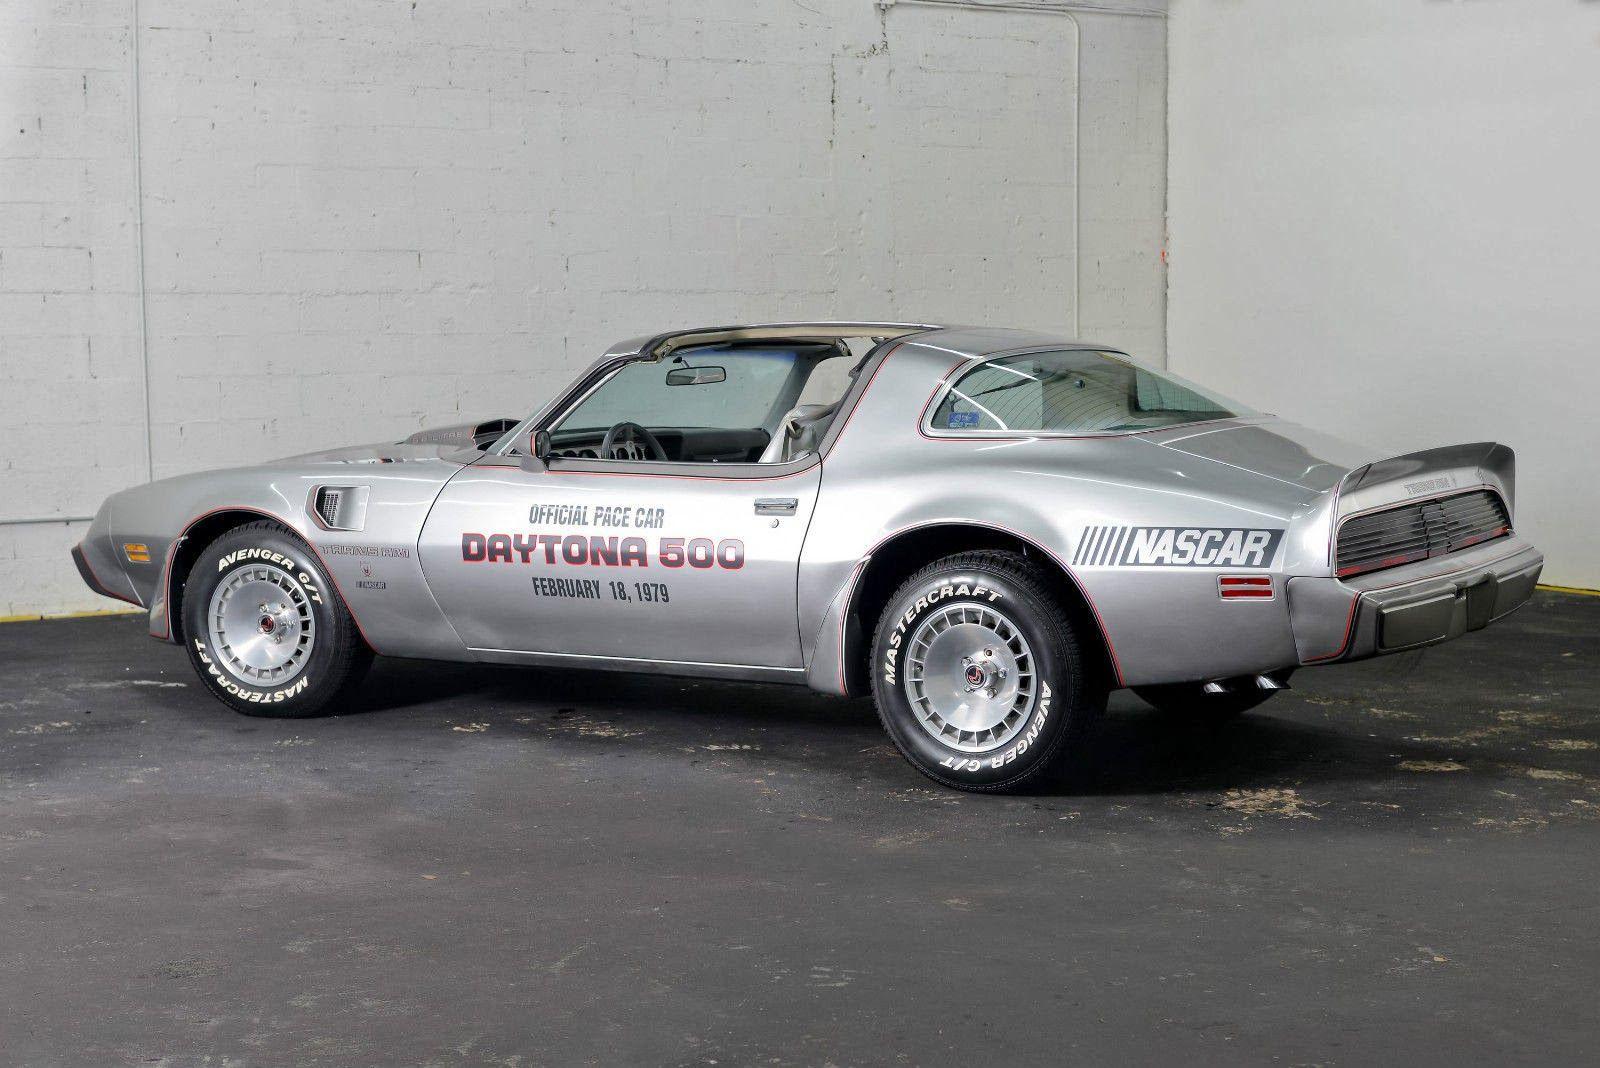 1979 Pontiac Trans Am10th Anniversary Daytona 500 Pace Car